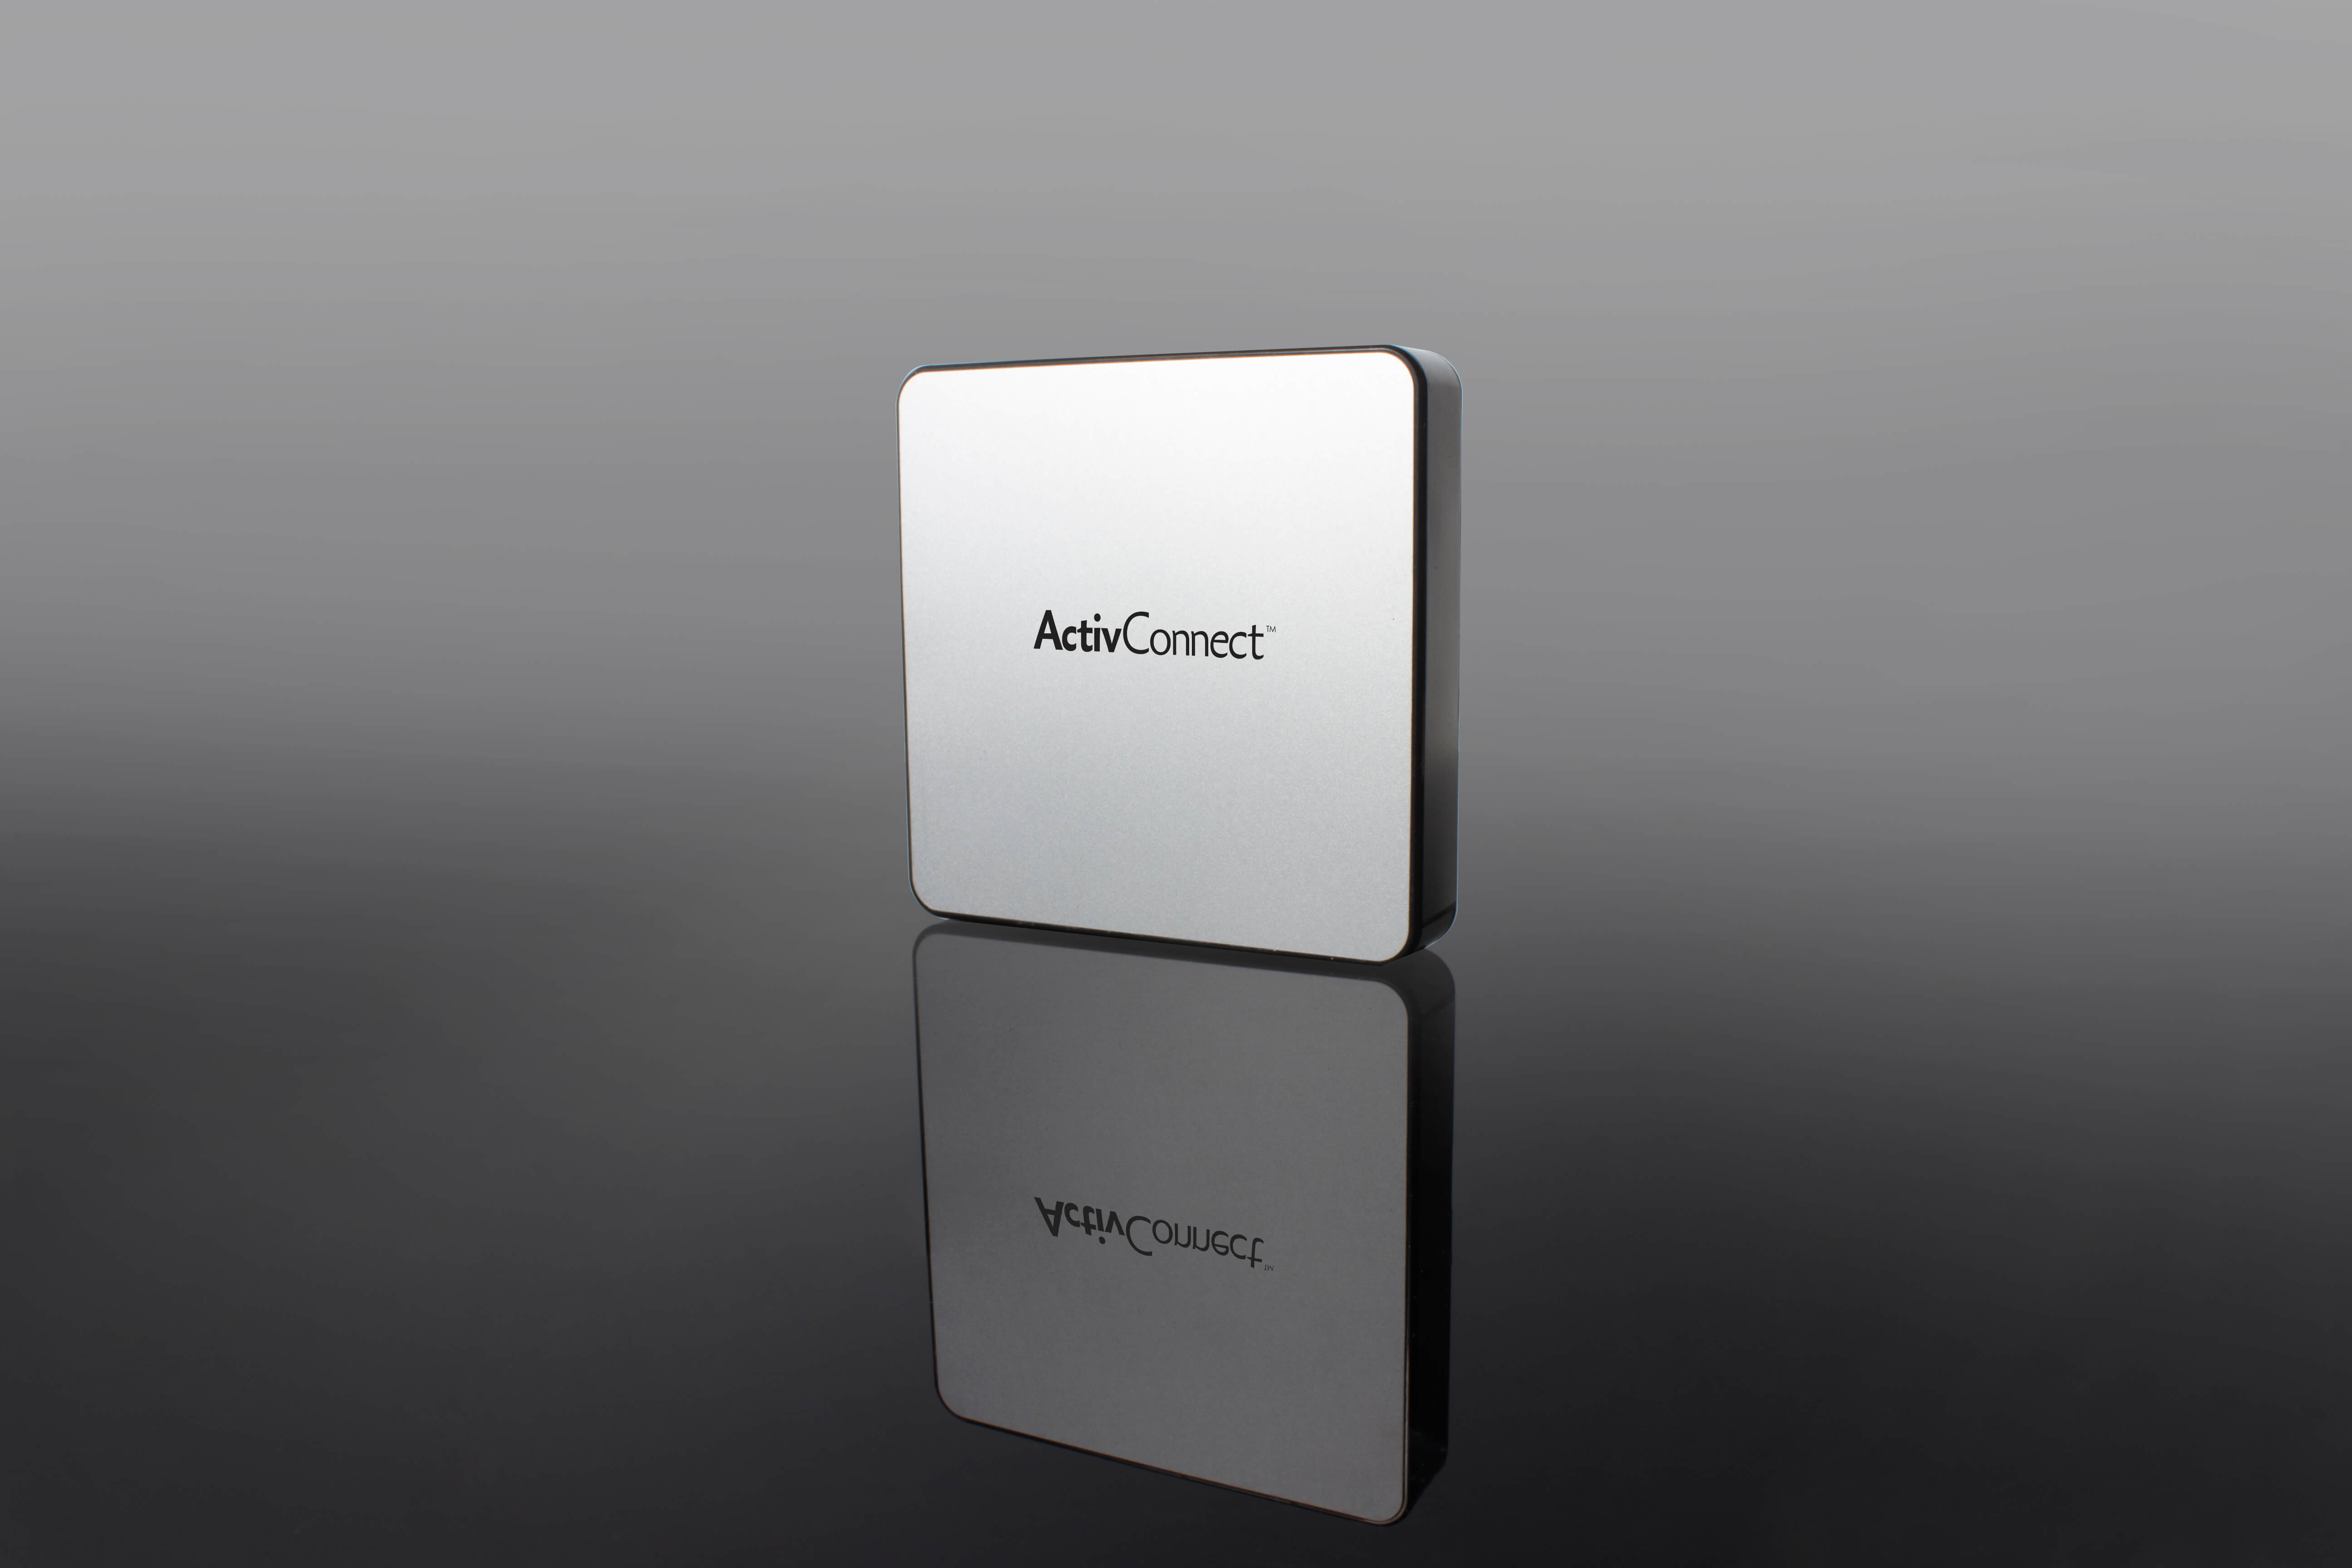 Promethean ActivConnect Box